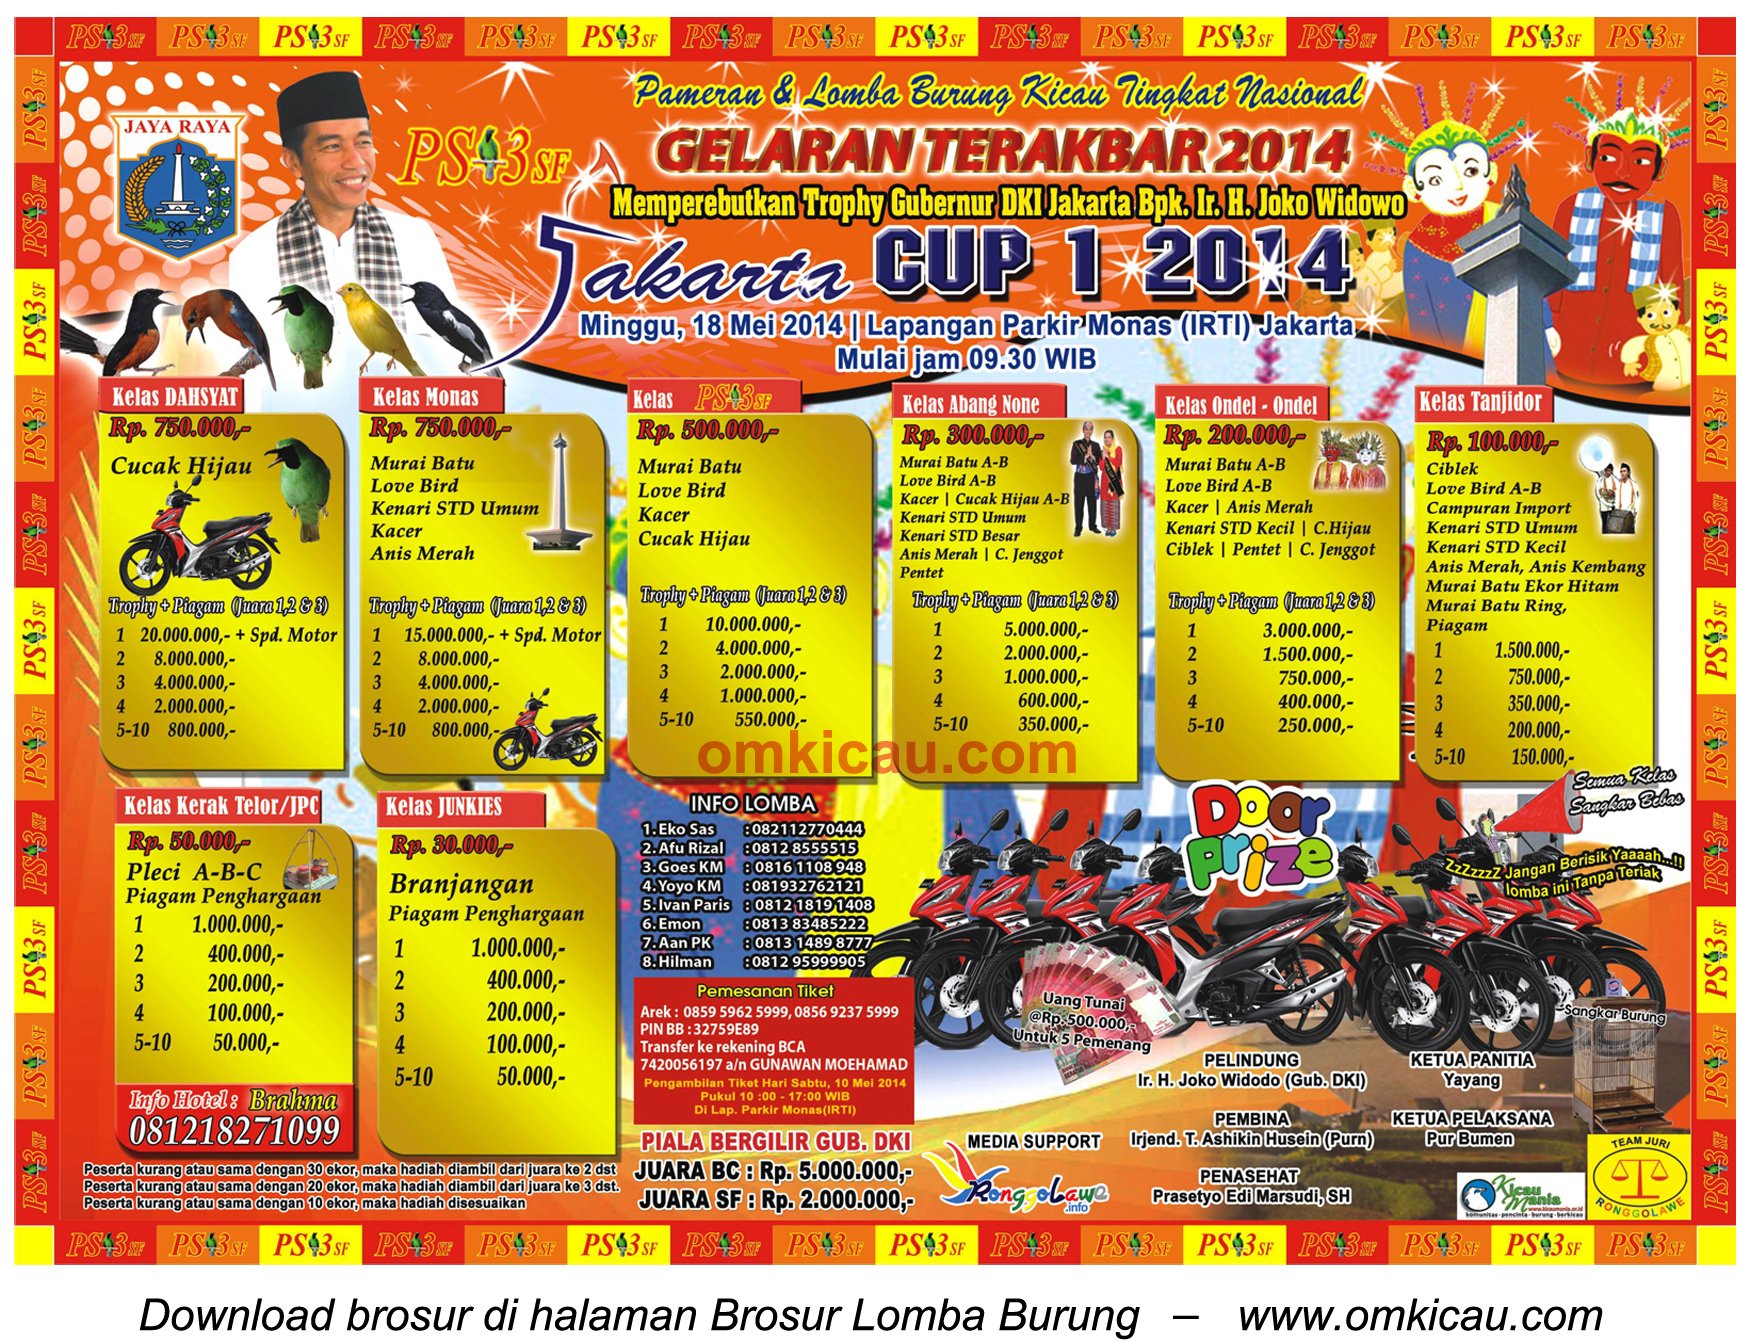 Brosur Lomba Burung Berkicau Jakarta Cup 1, Jakarta, 18 Mei 2014